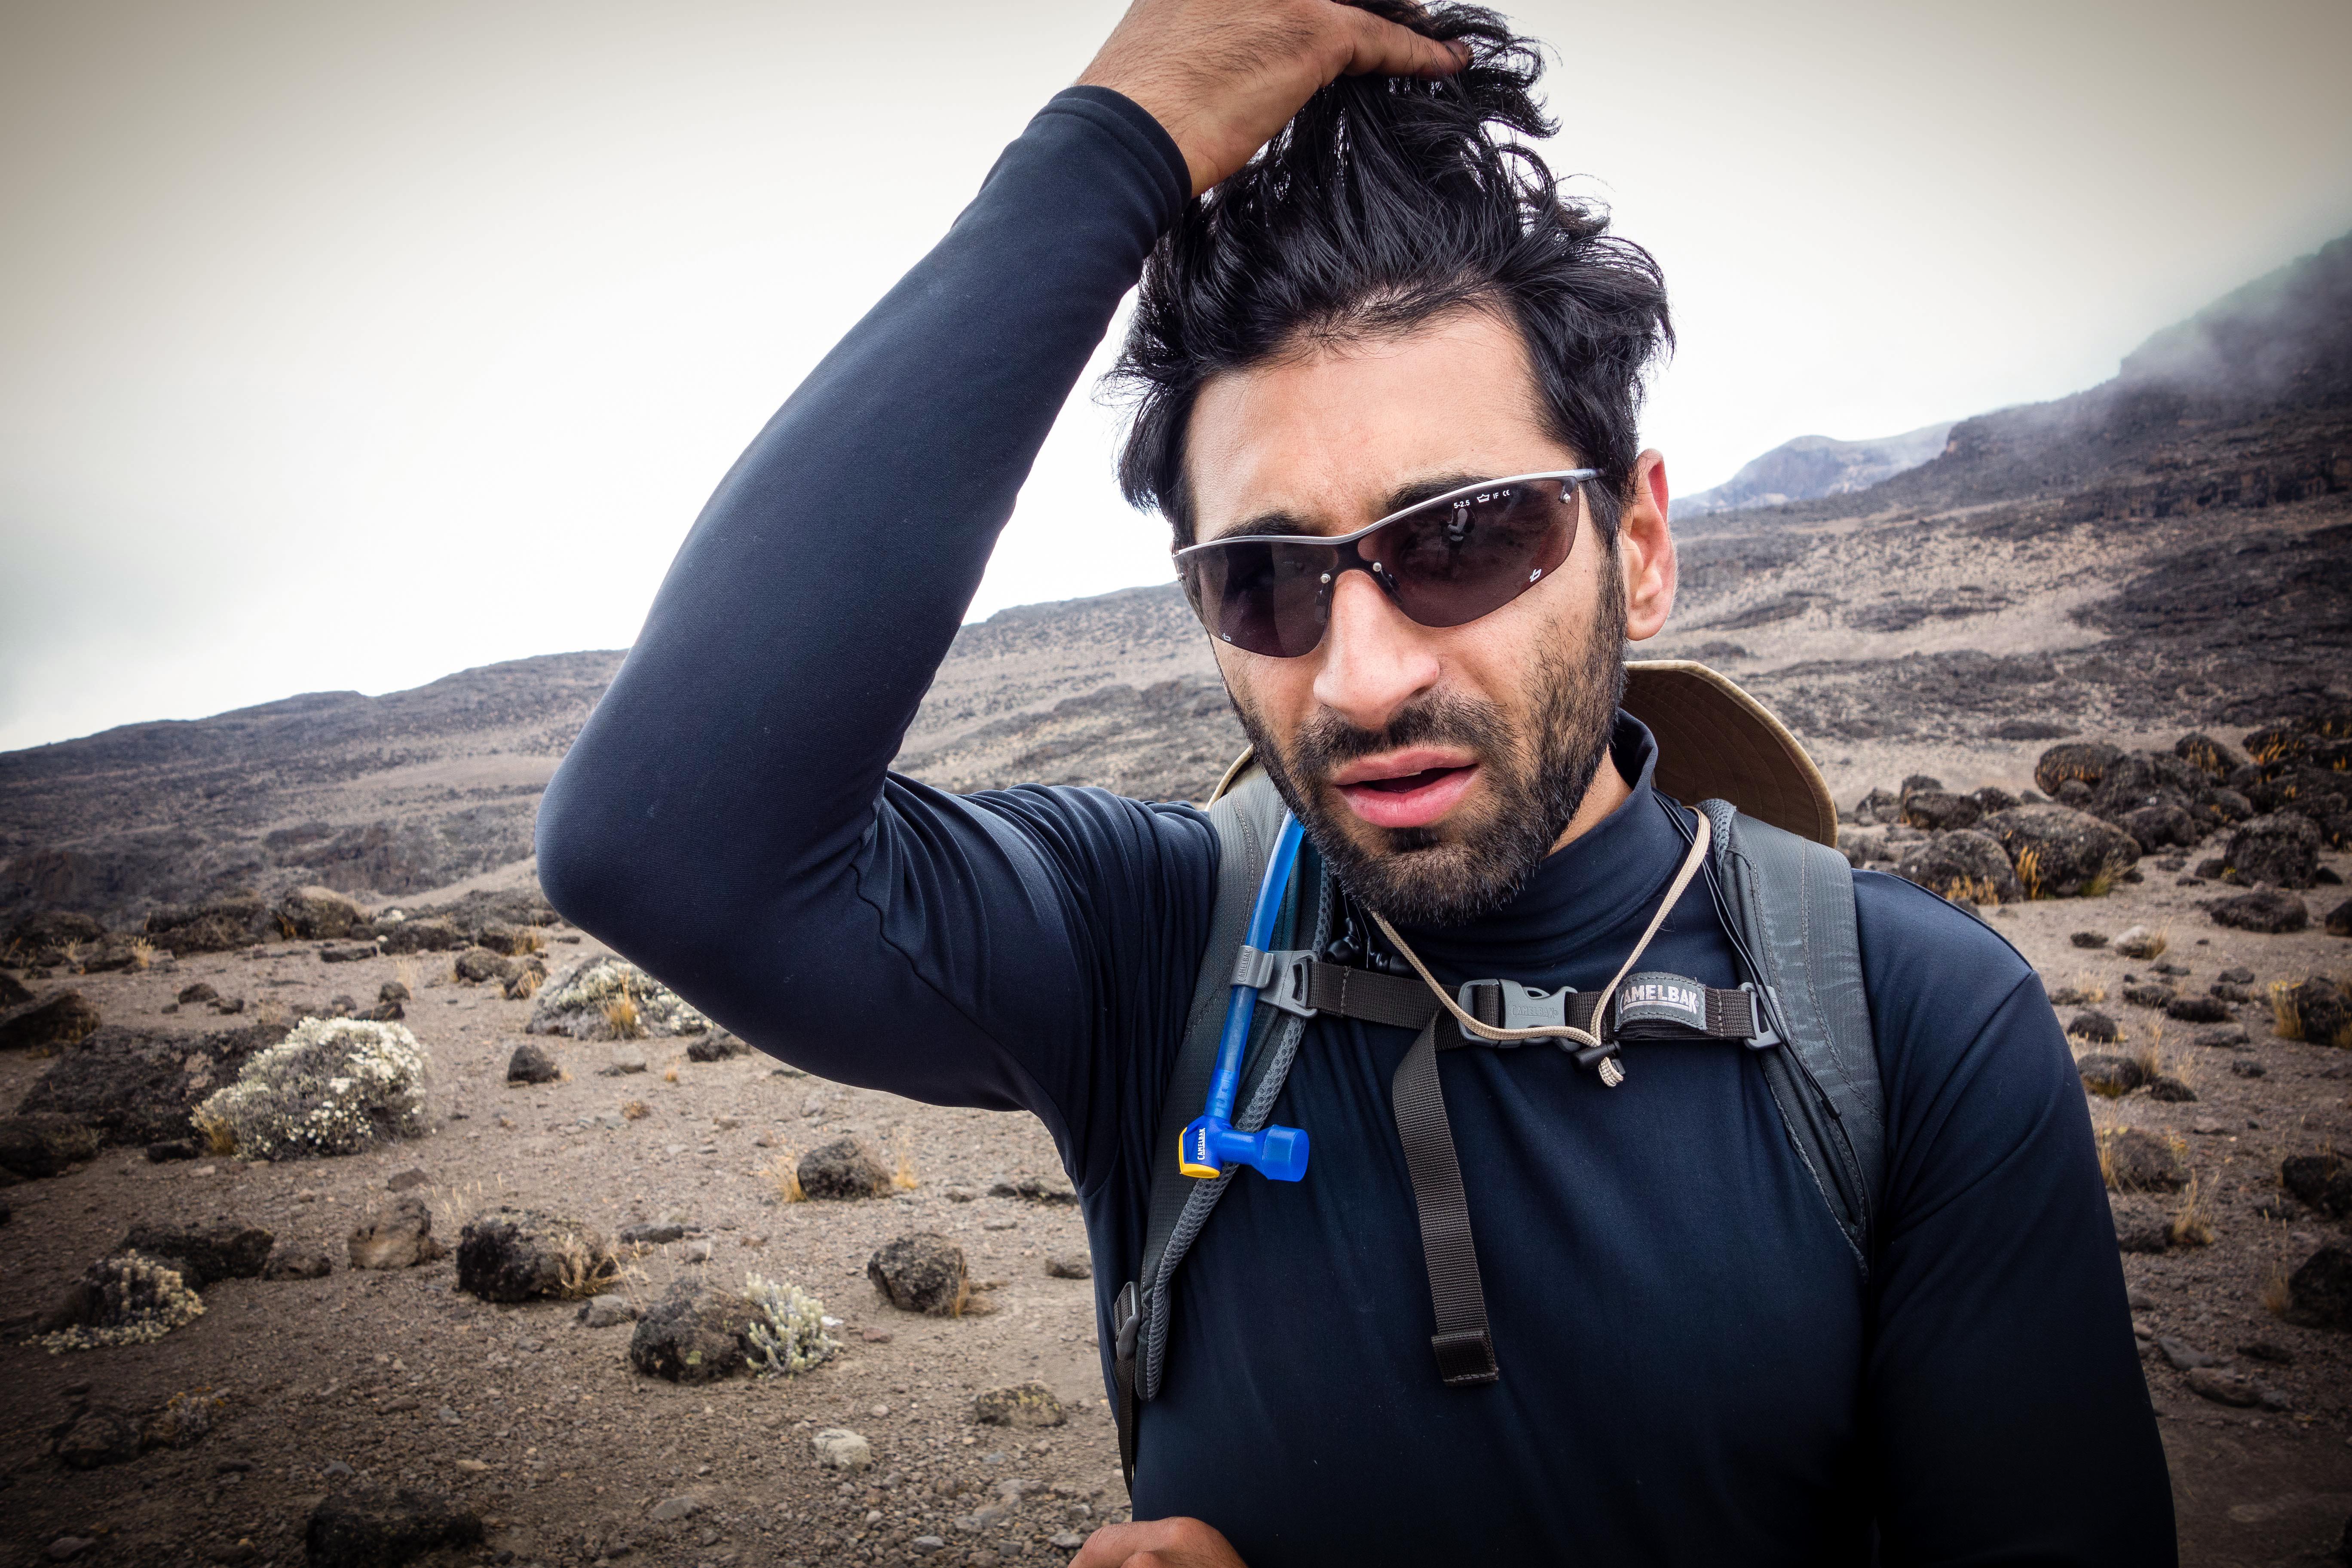 Kilimanjaro Arman Assadi 2015